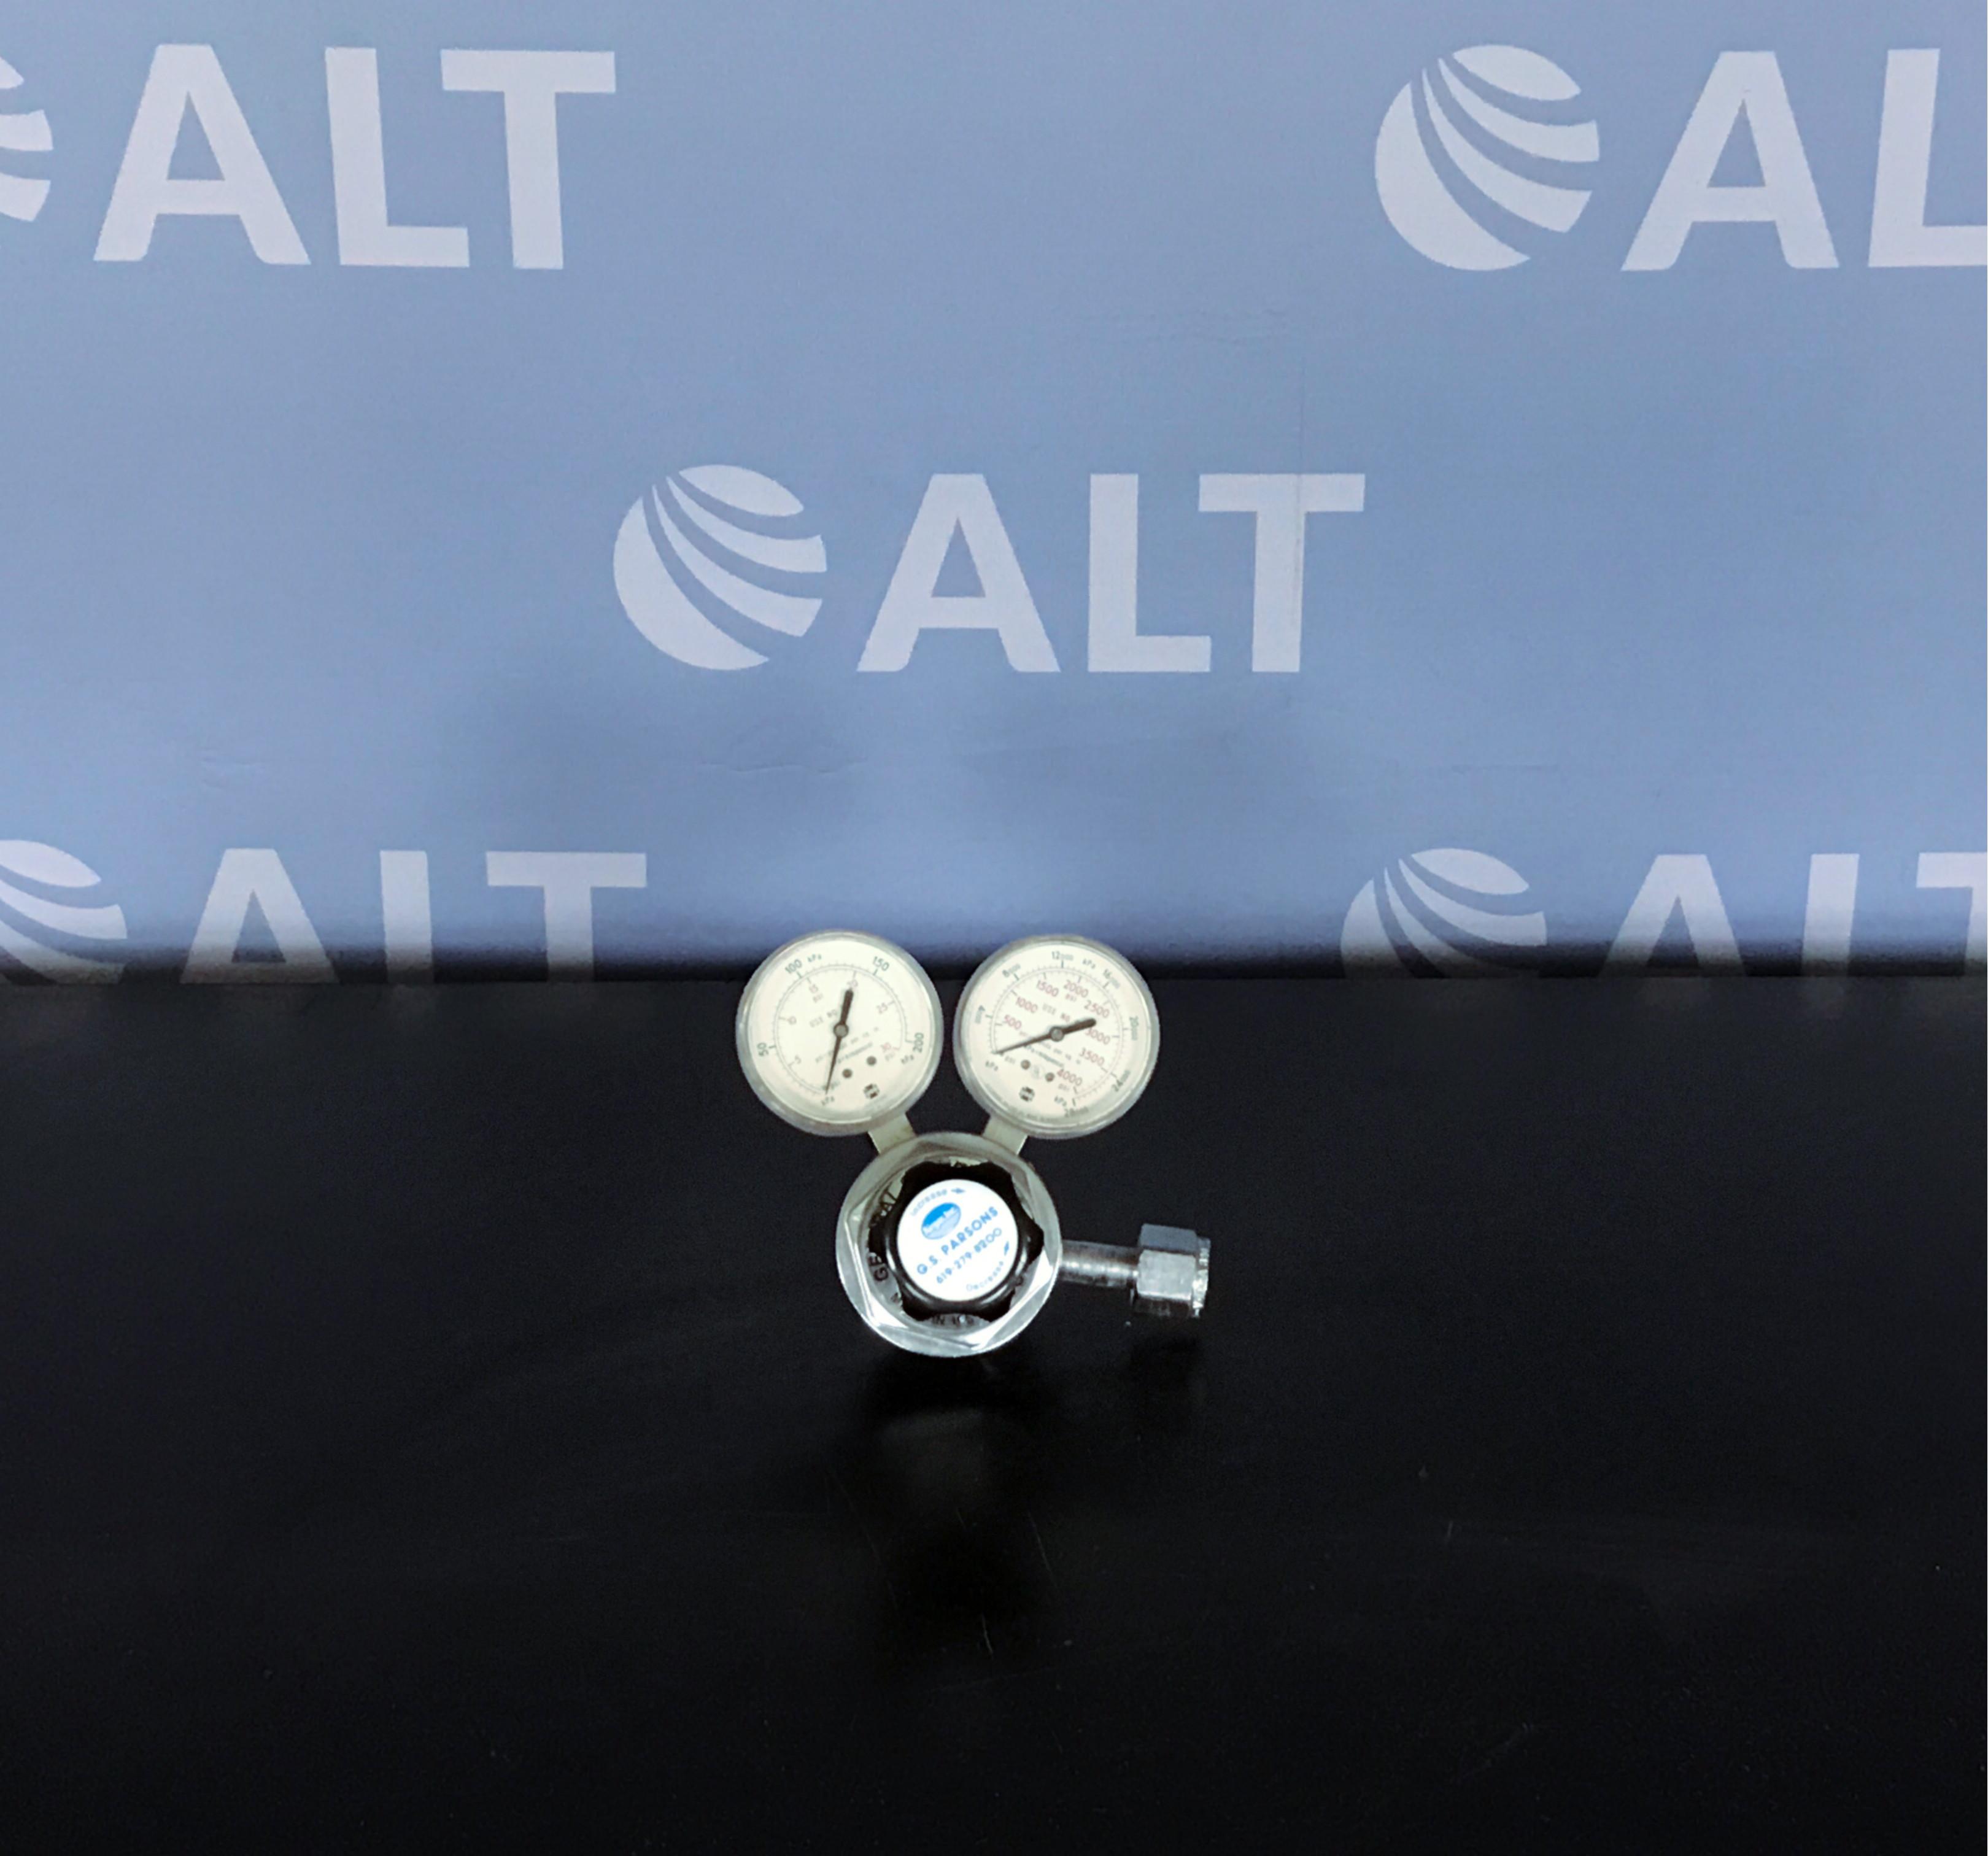 Airgas Gpt-270a Compressed Nitrogen & Inert Gas Regulator Image